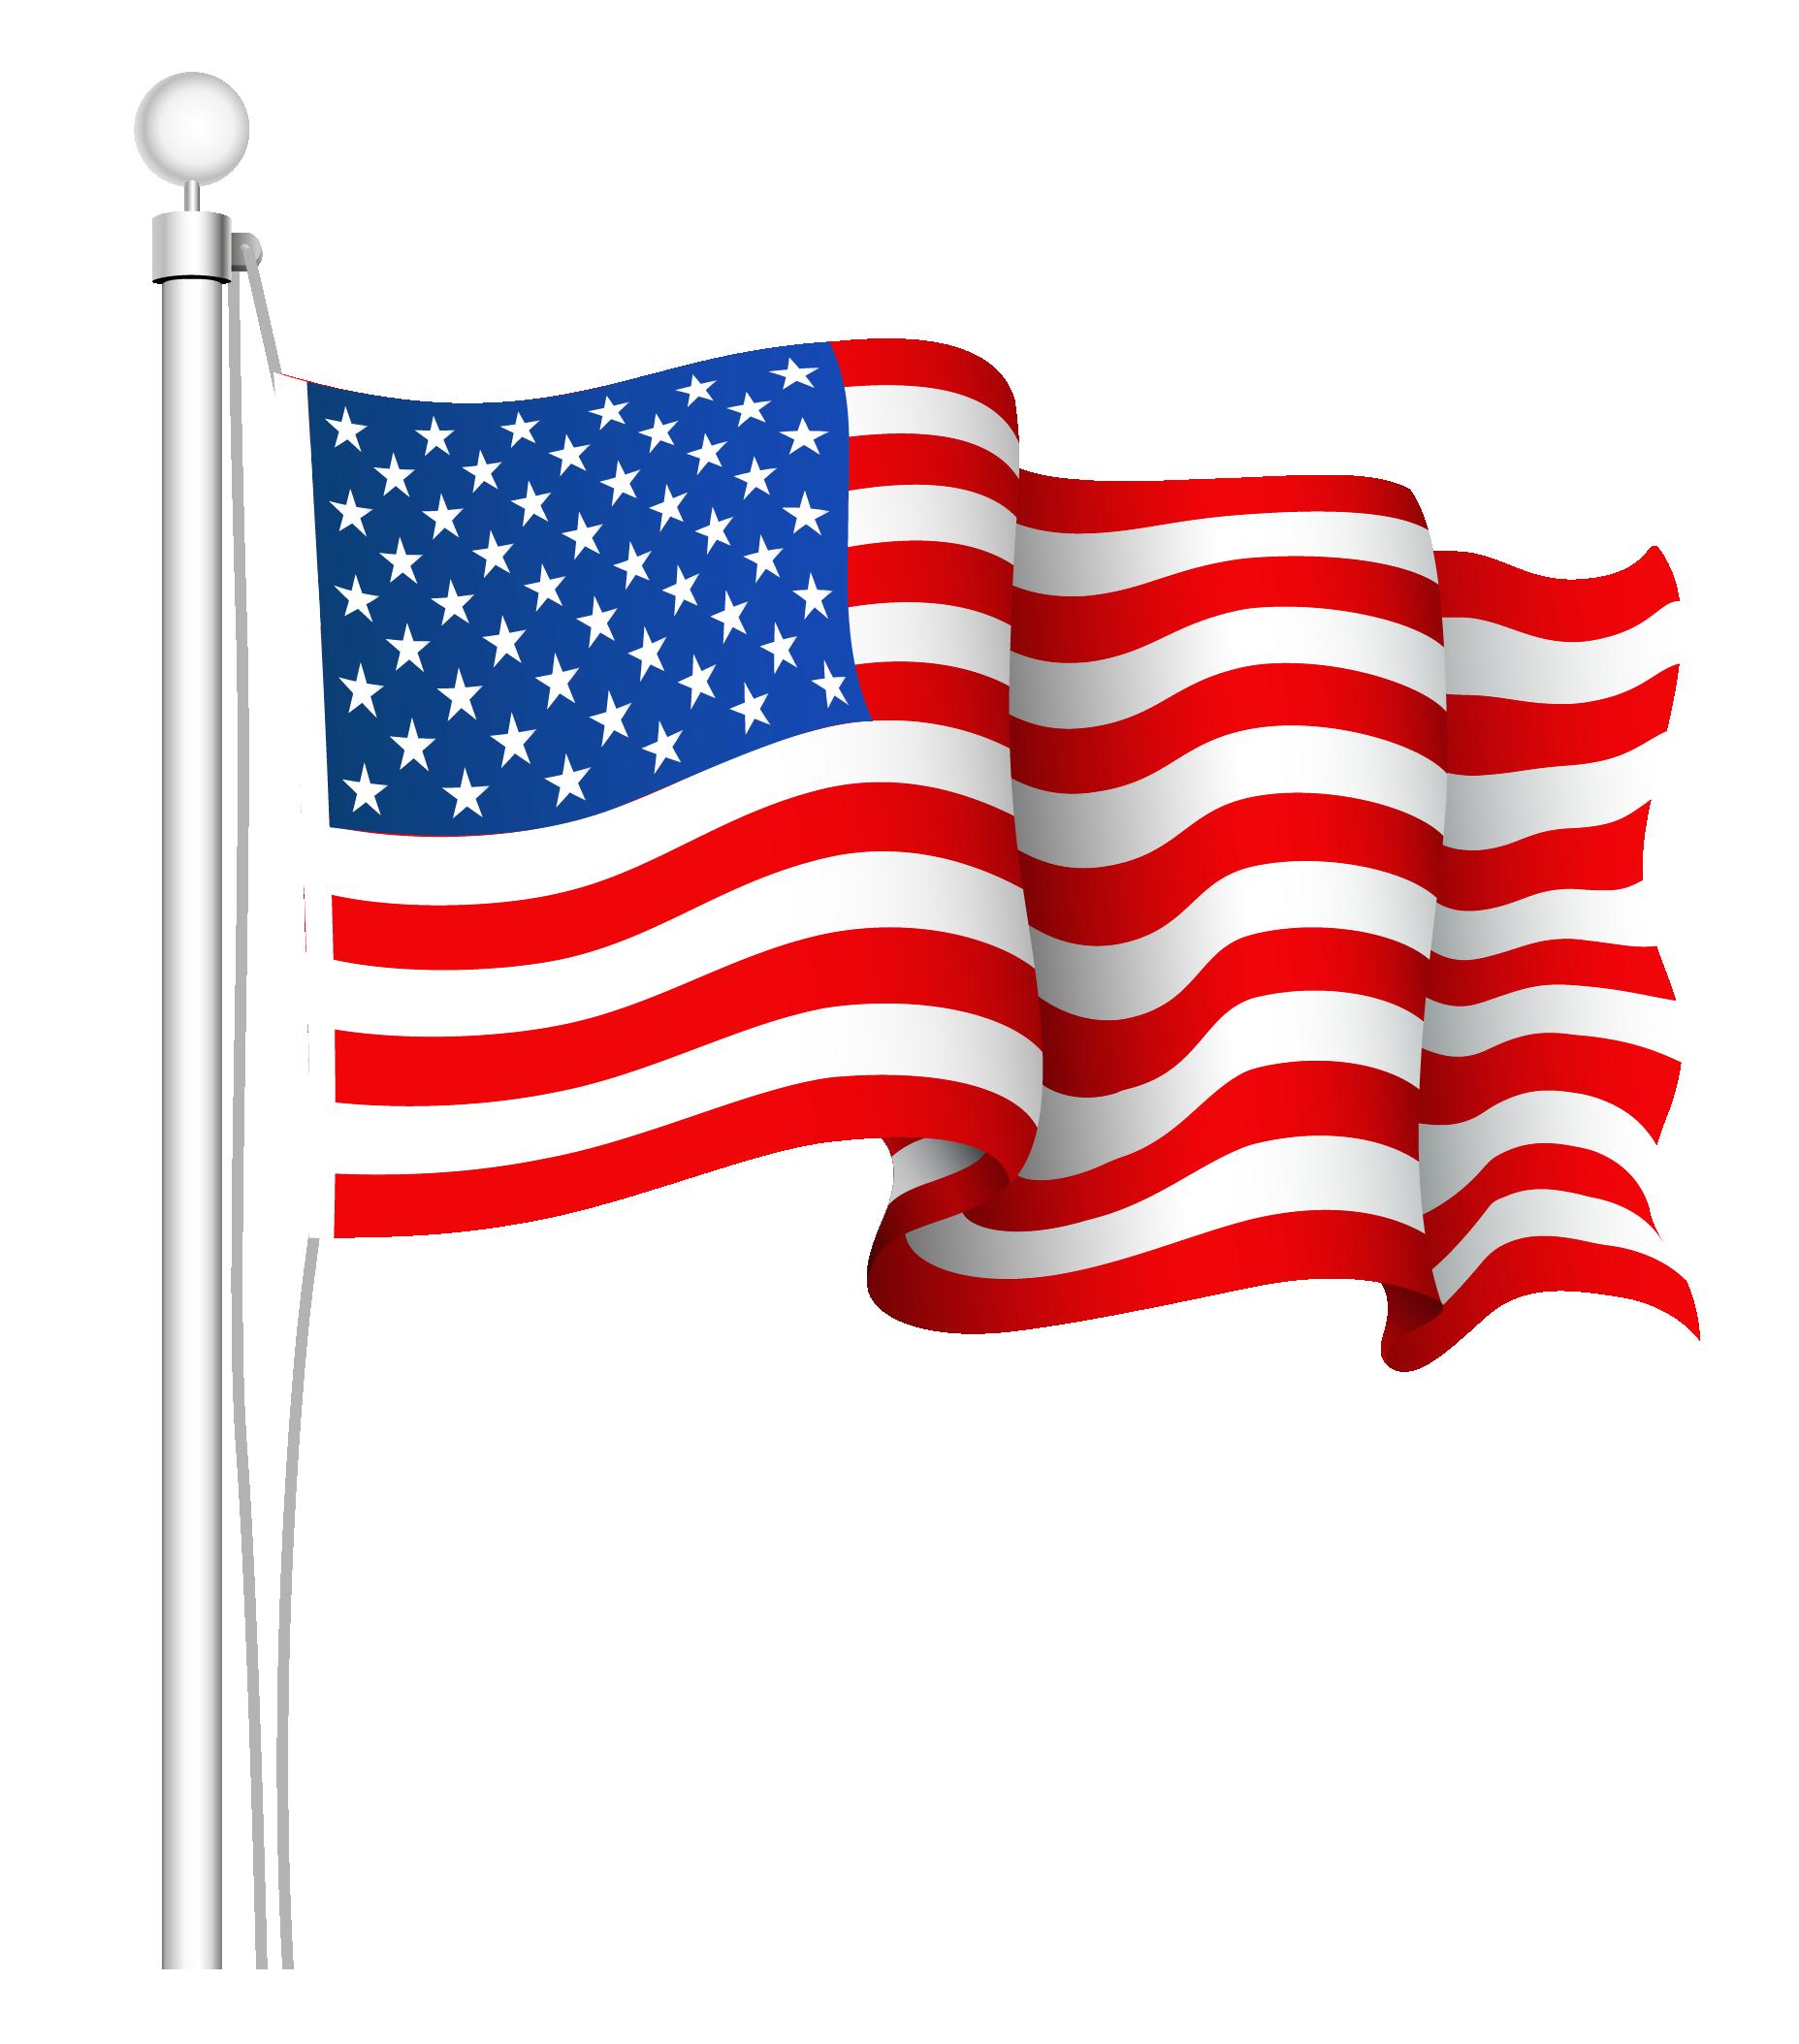 Clip art flag free usa dromfei .